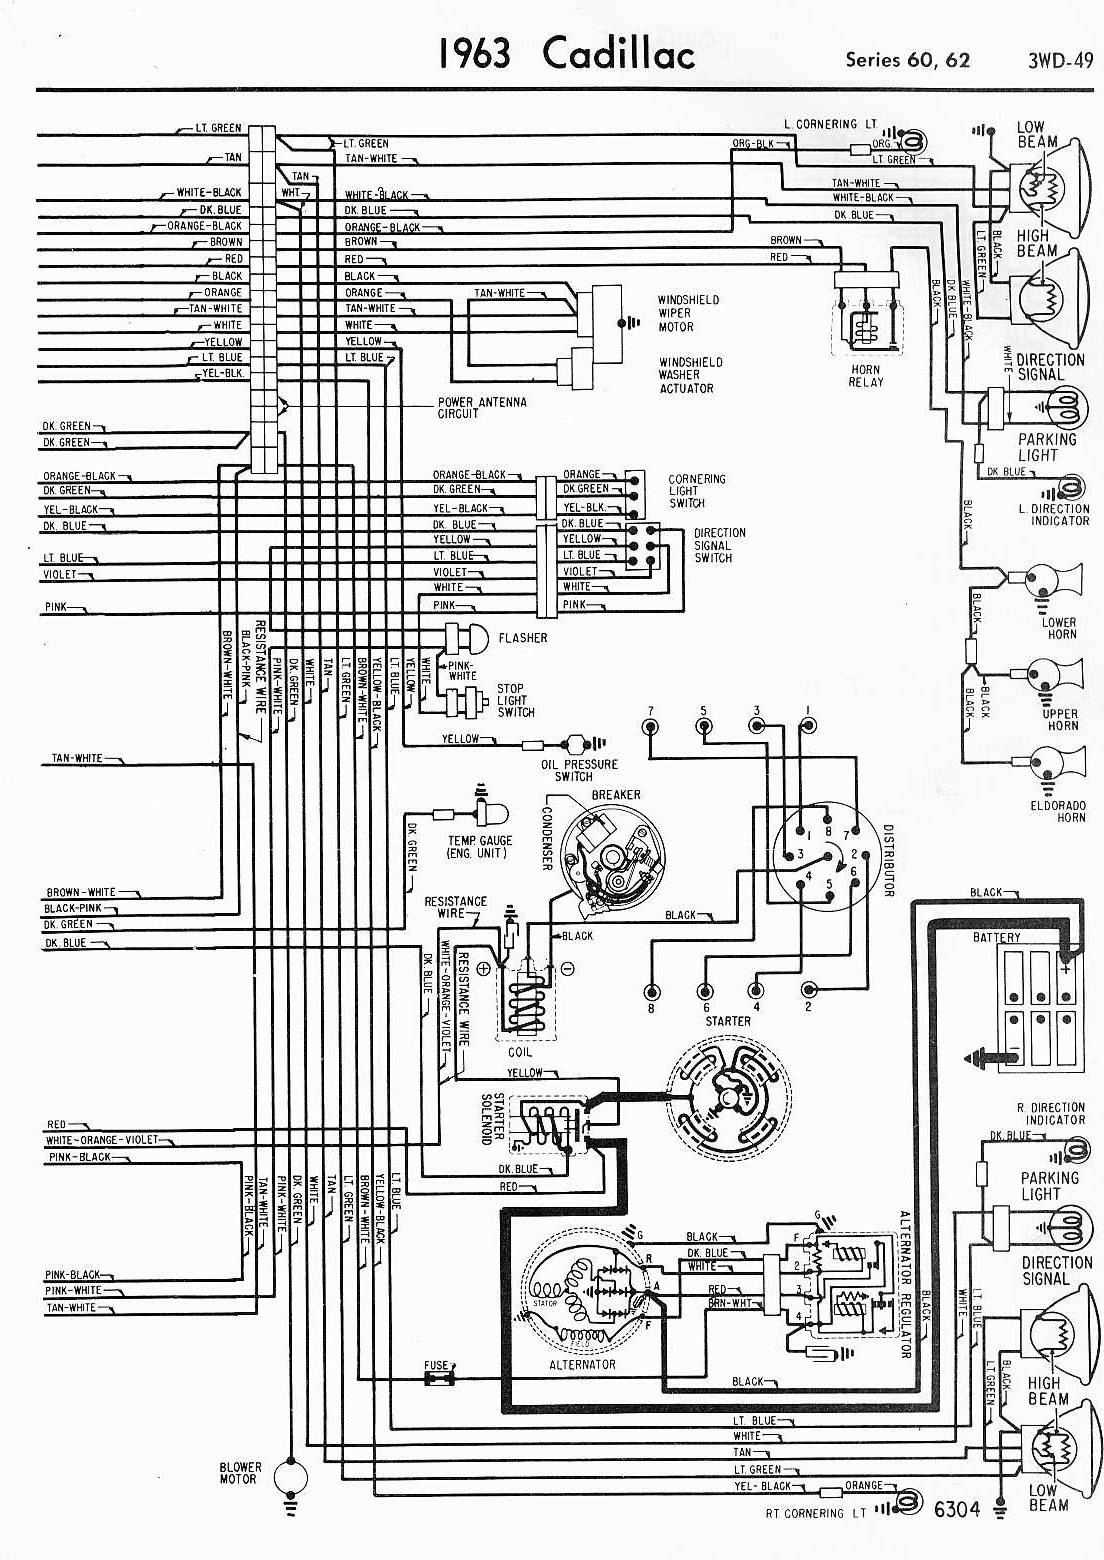 Windshield Wiper Motor Wiring Diagram For 1984 Cadillac Eldorado Free Vehicle Diagrams Parts U2022 Rh Addone Tw